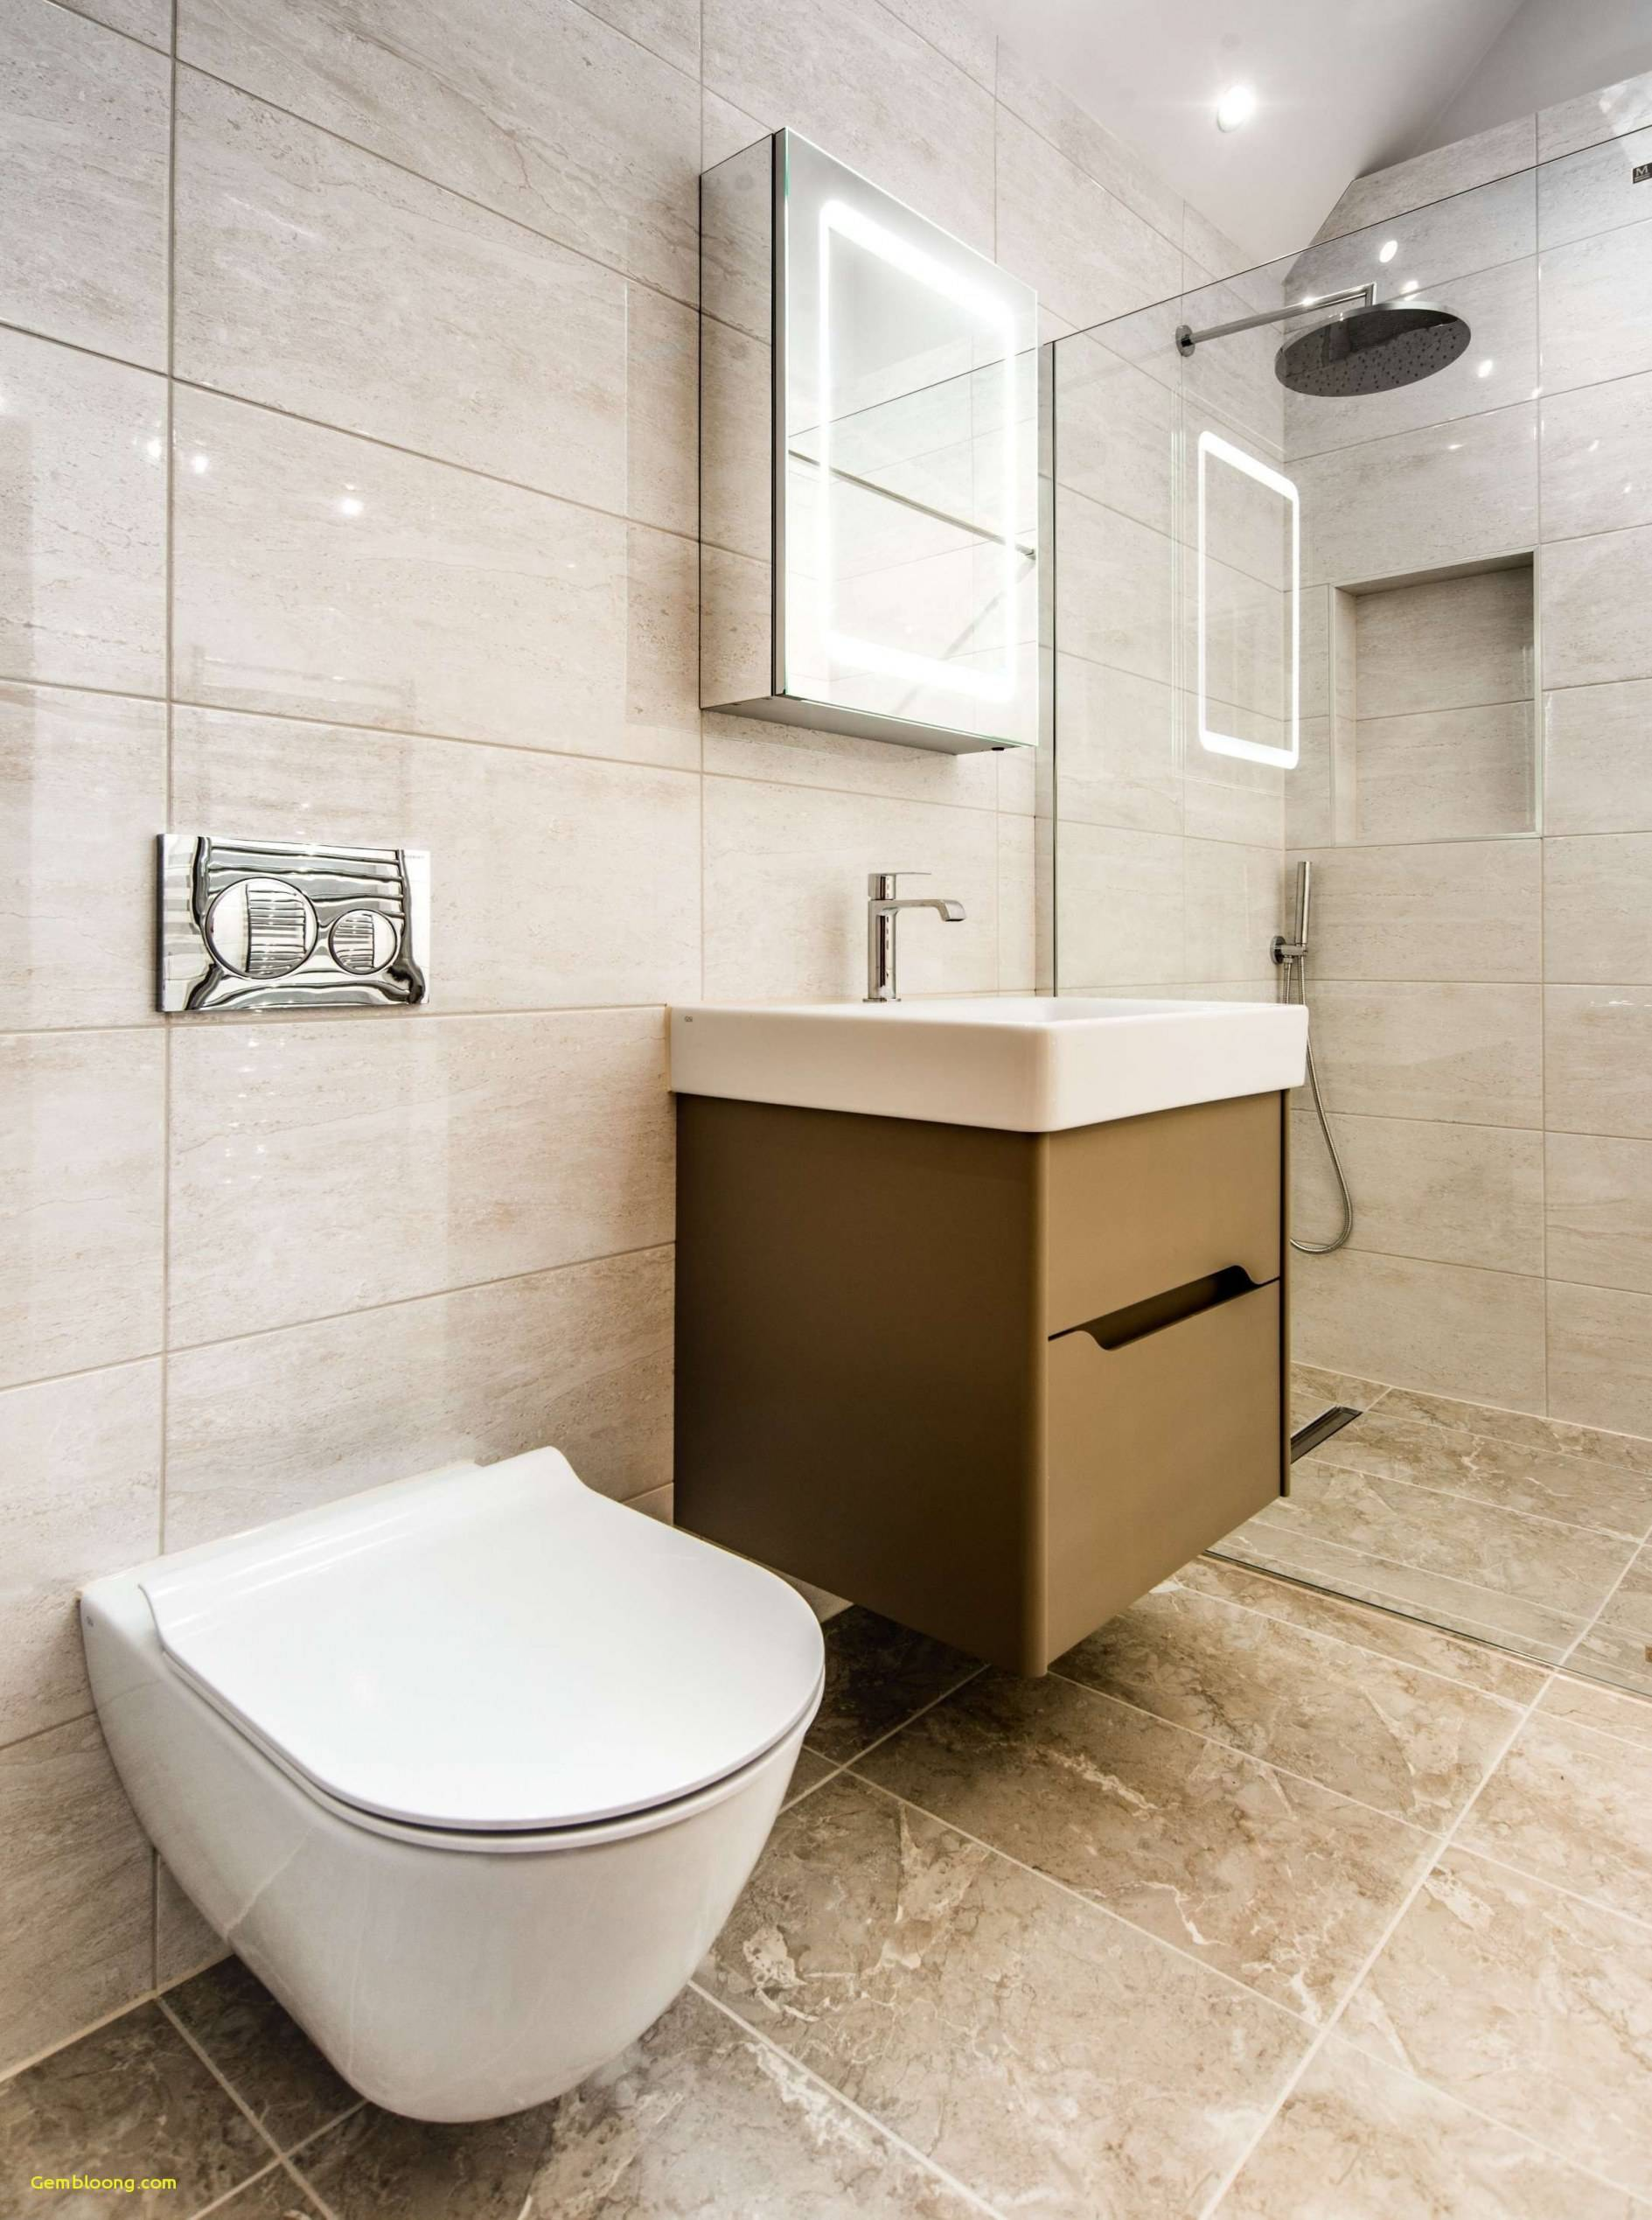 small bathroom designs inspirational small bathroom remodel cost of small bathroom designs